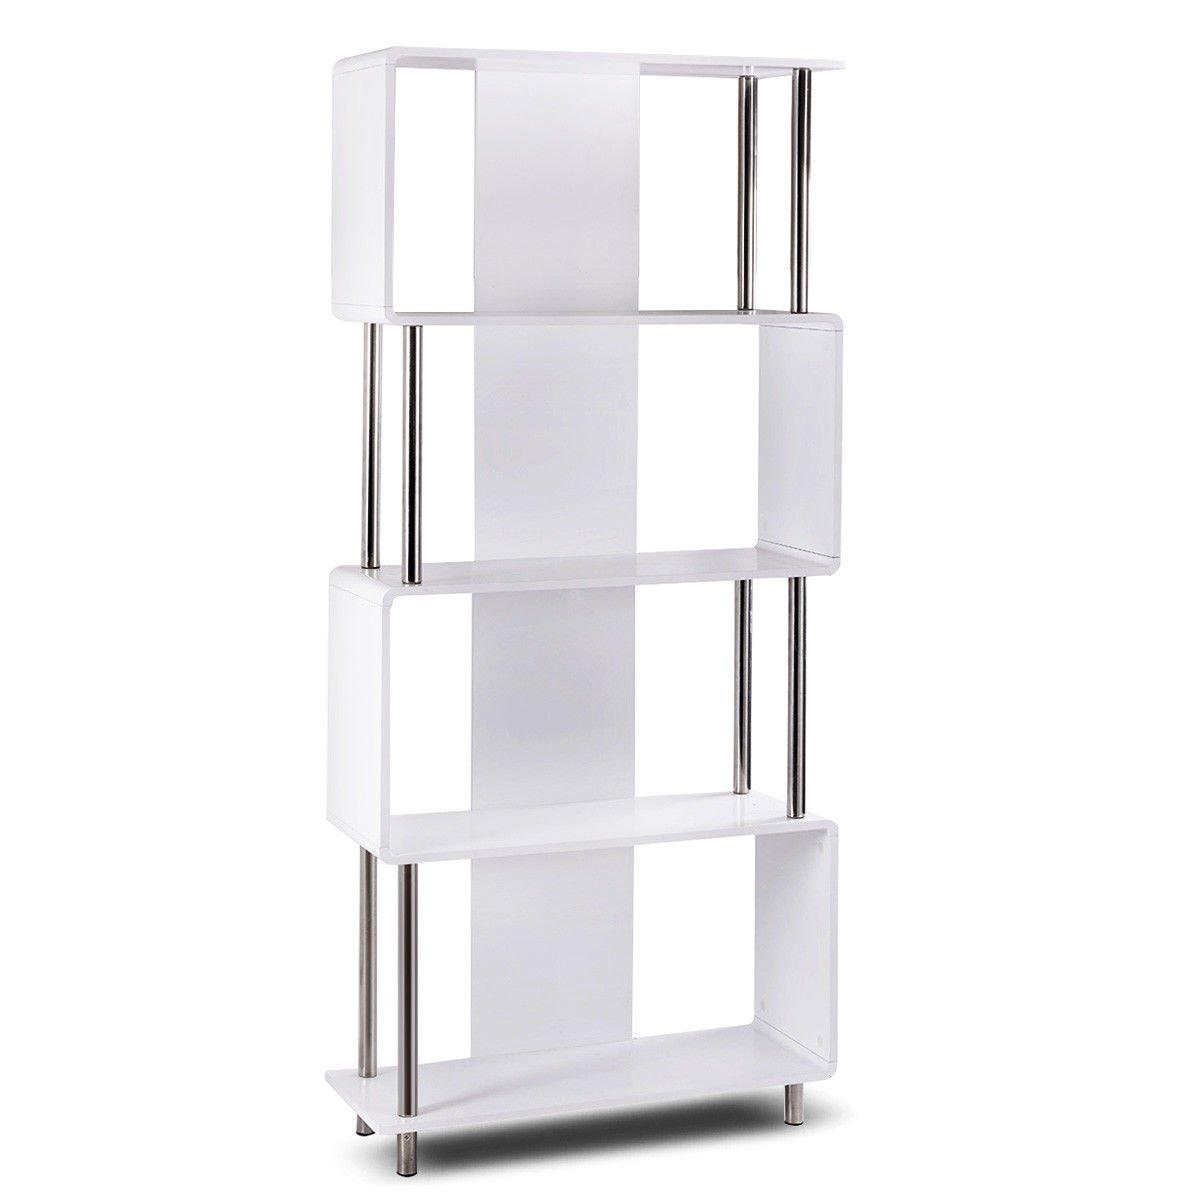 FDInspiration White MDF 4 Storage Shelf Display Unit Bookshelf w/Geometric Shape by FDInspiration